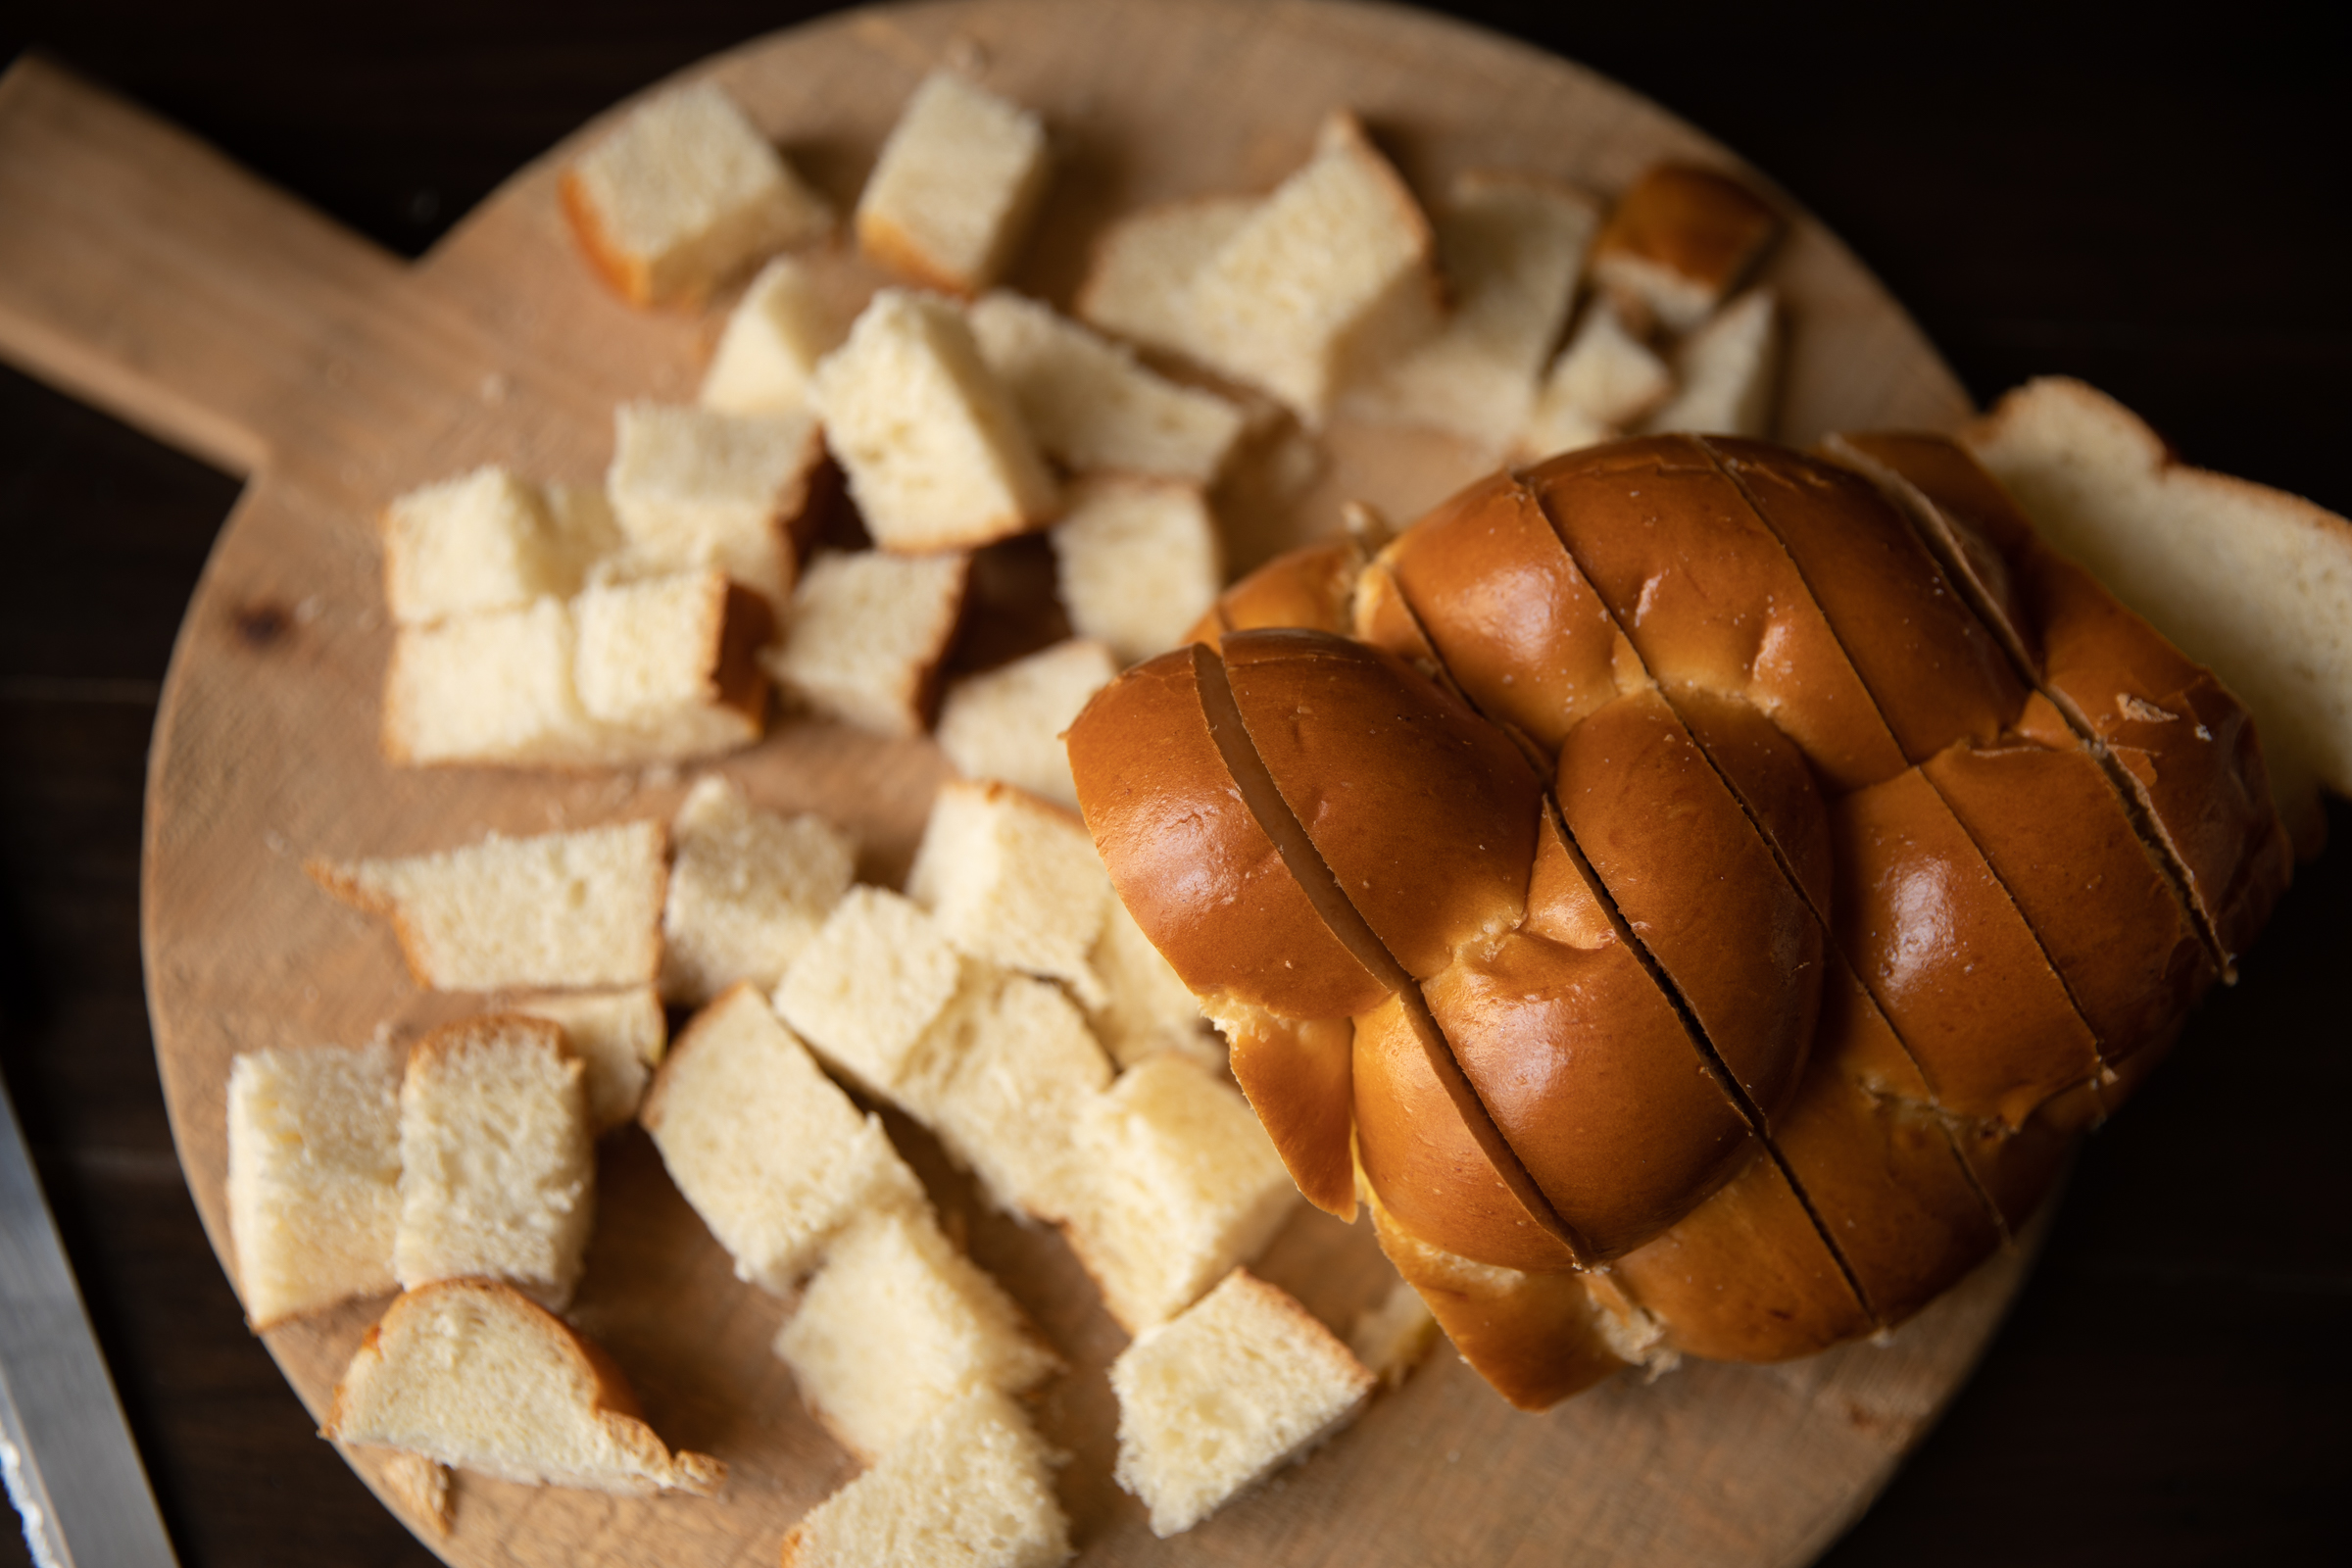 Cut up Challah bread